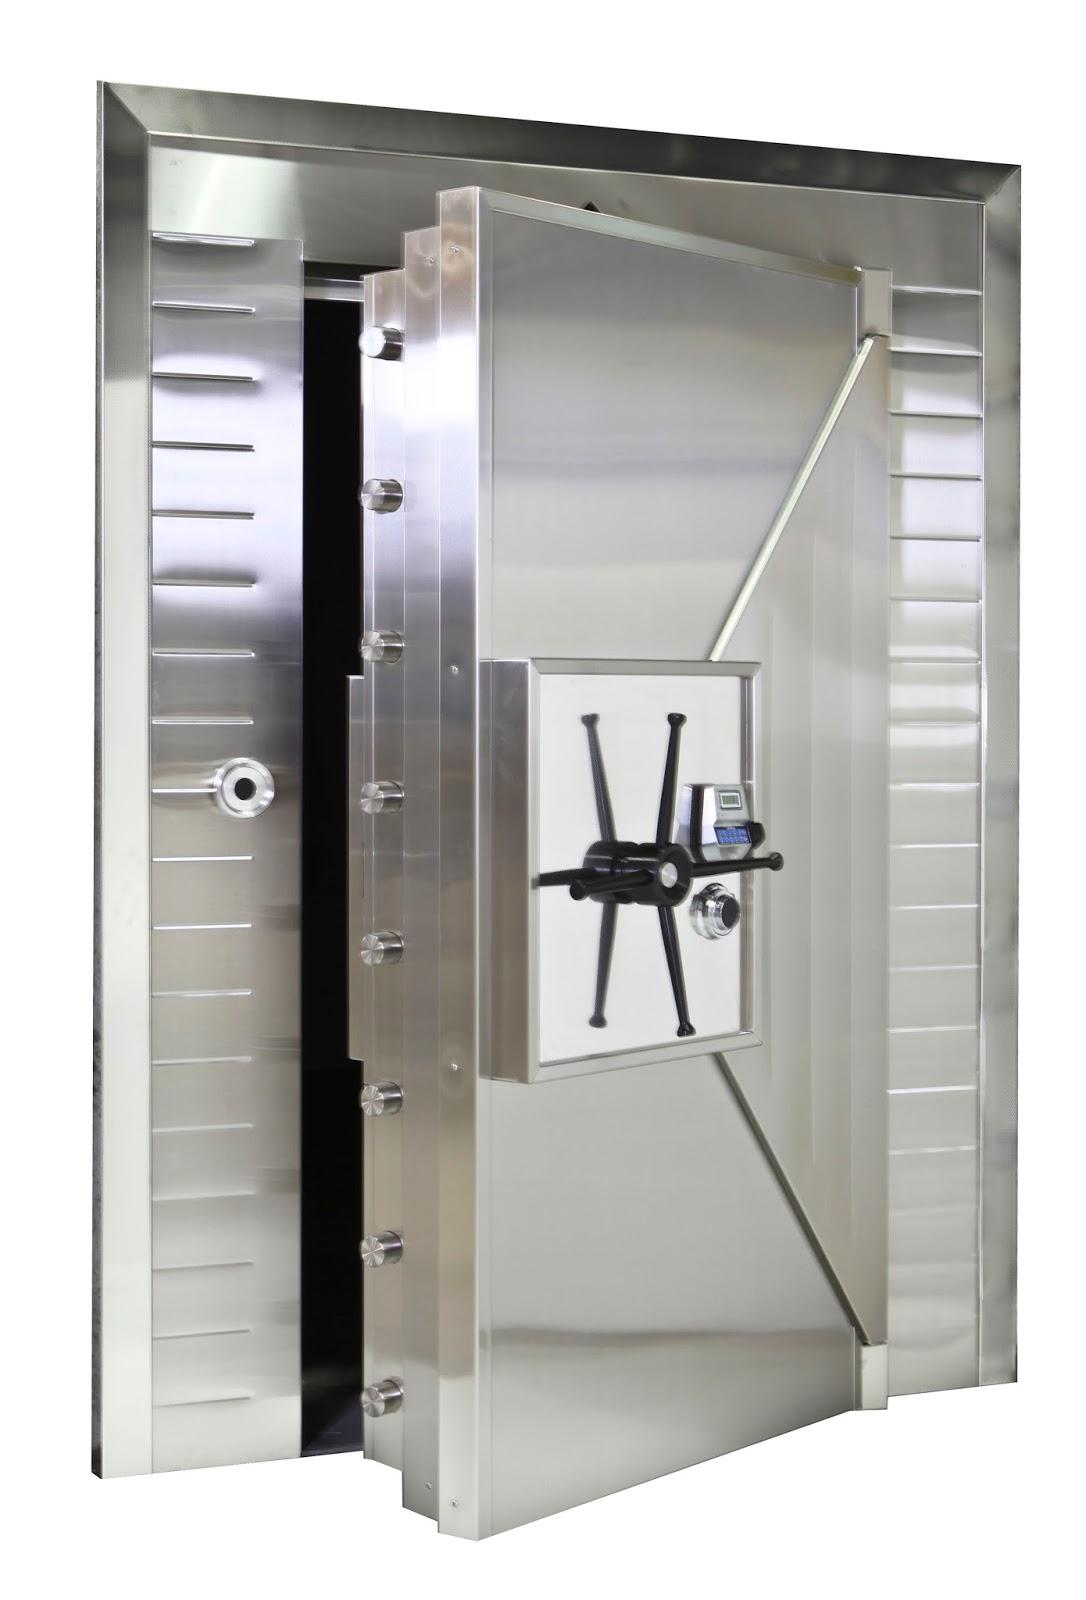 Bank Vault Doors : Consumer savvy reviews december